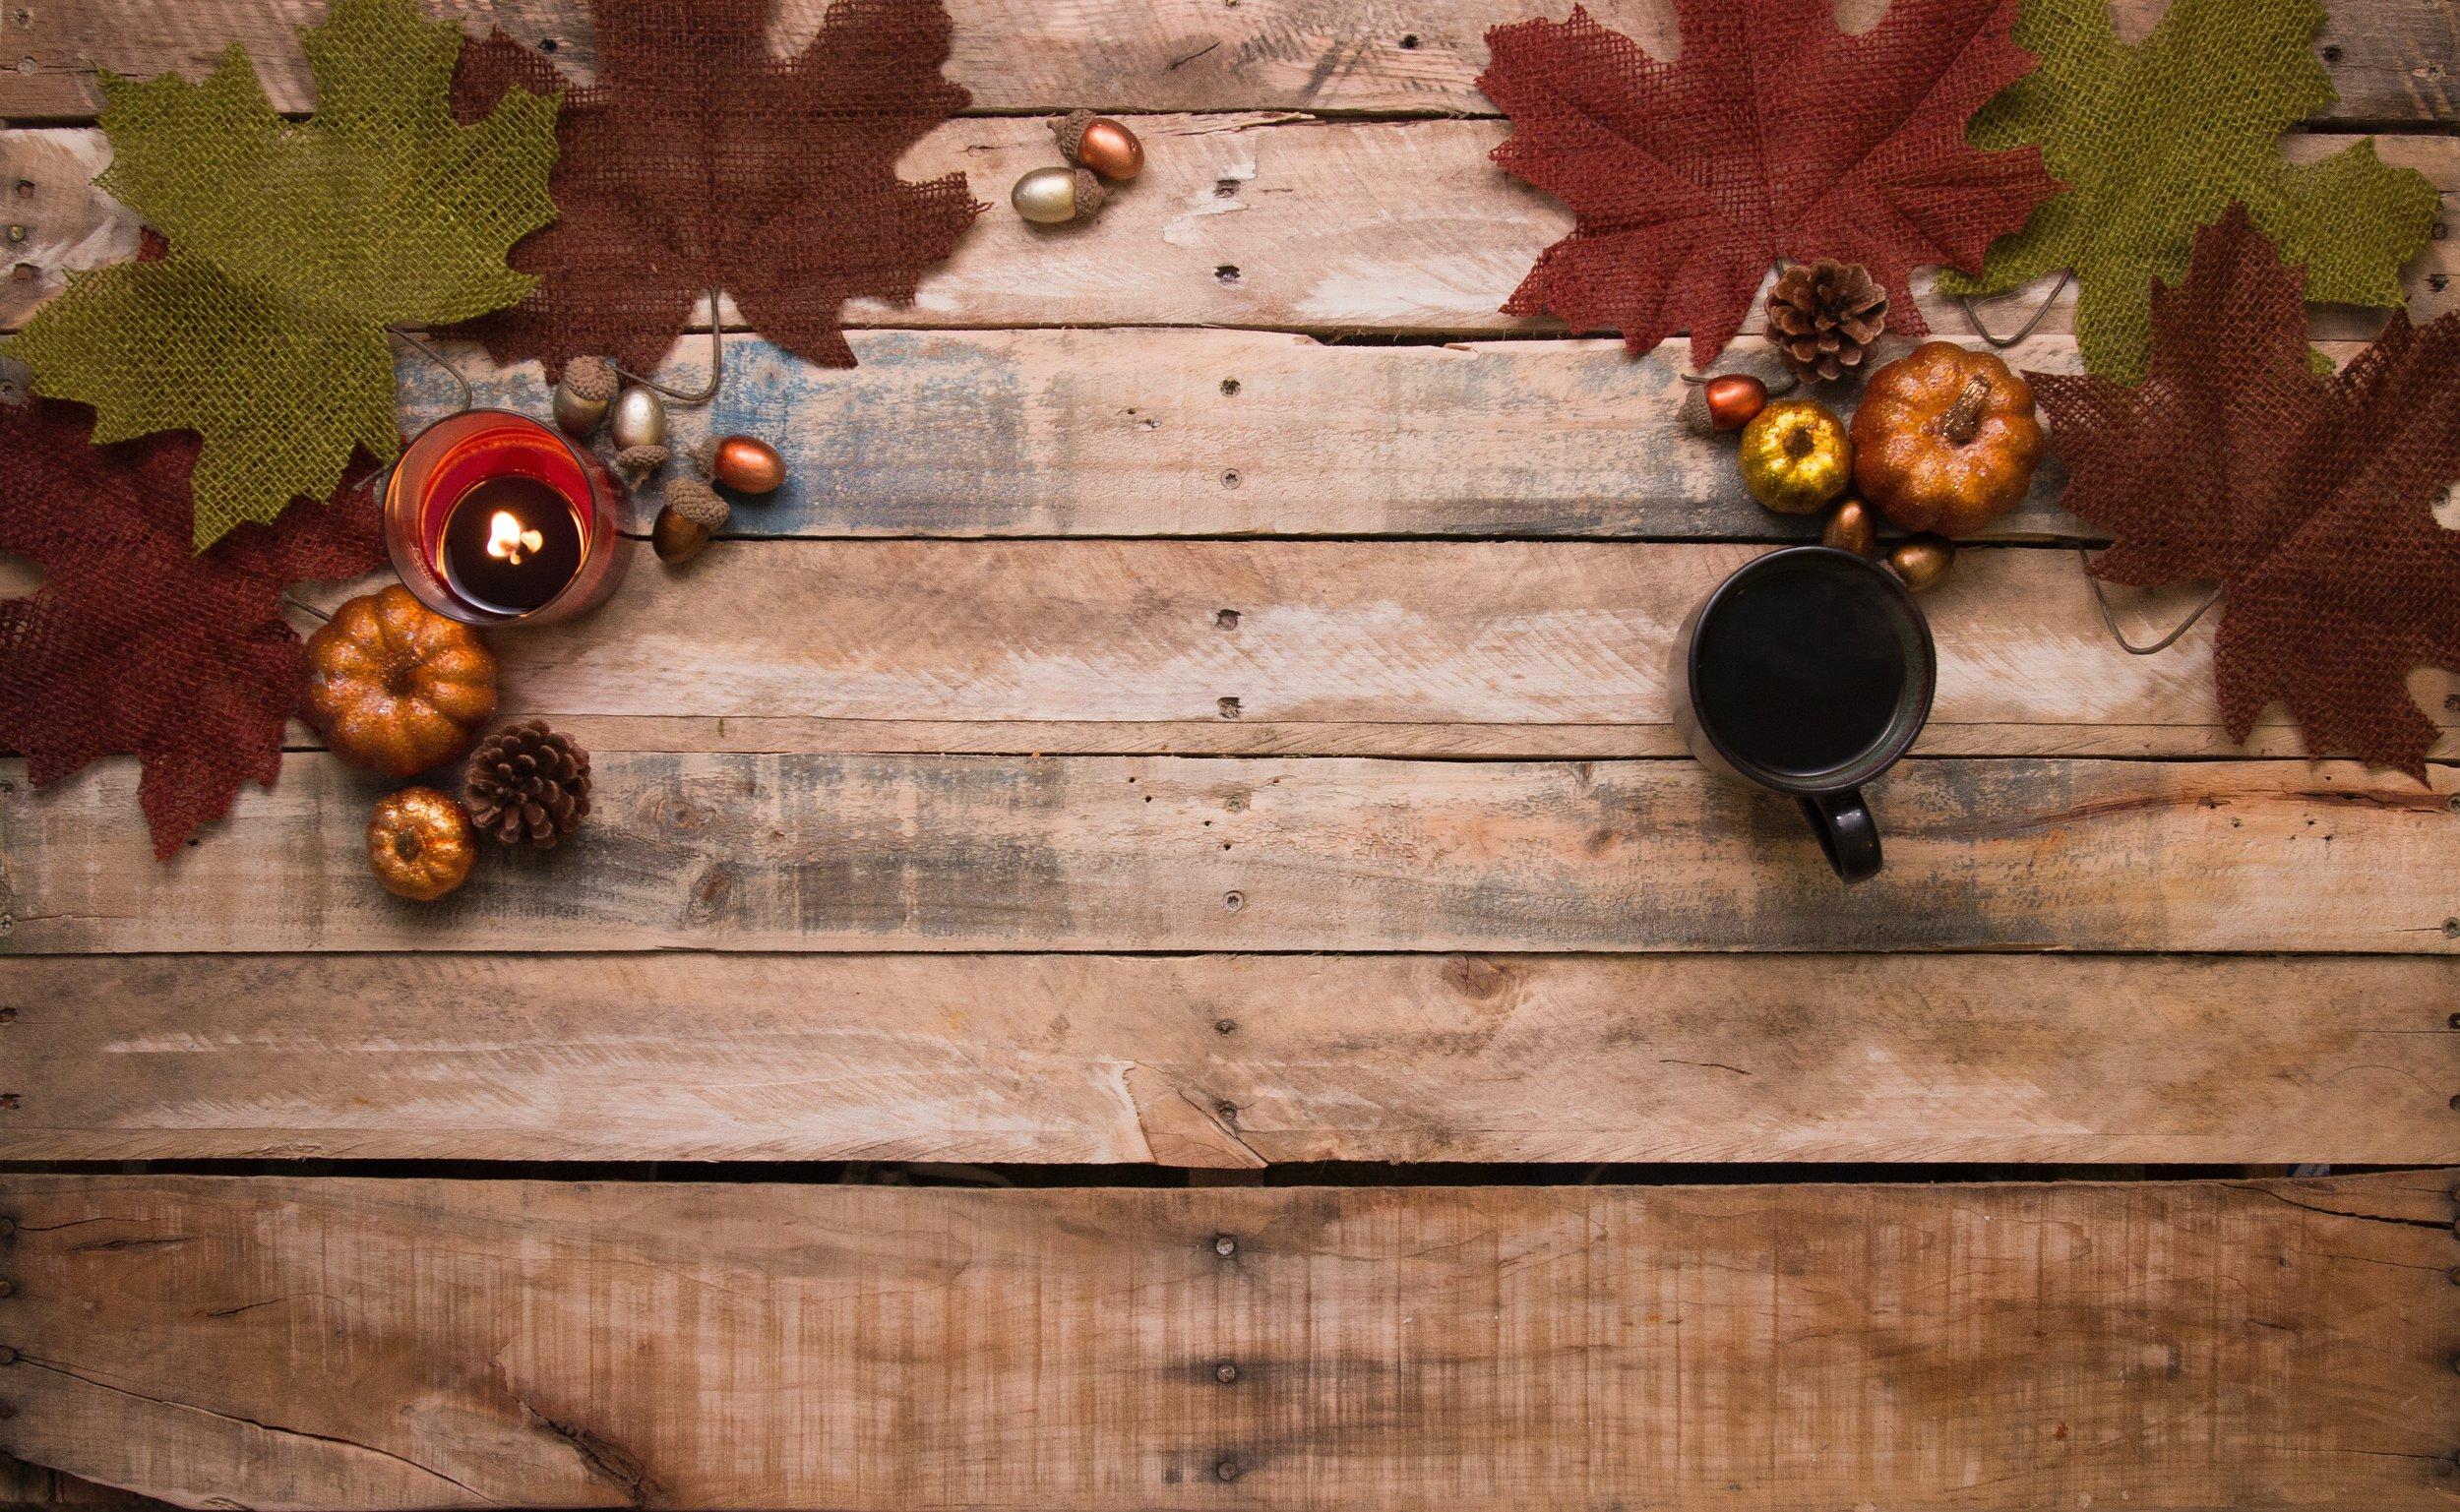 acorns-autumn-autumn-decoration-730286 (1).jpg